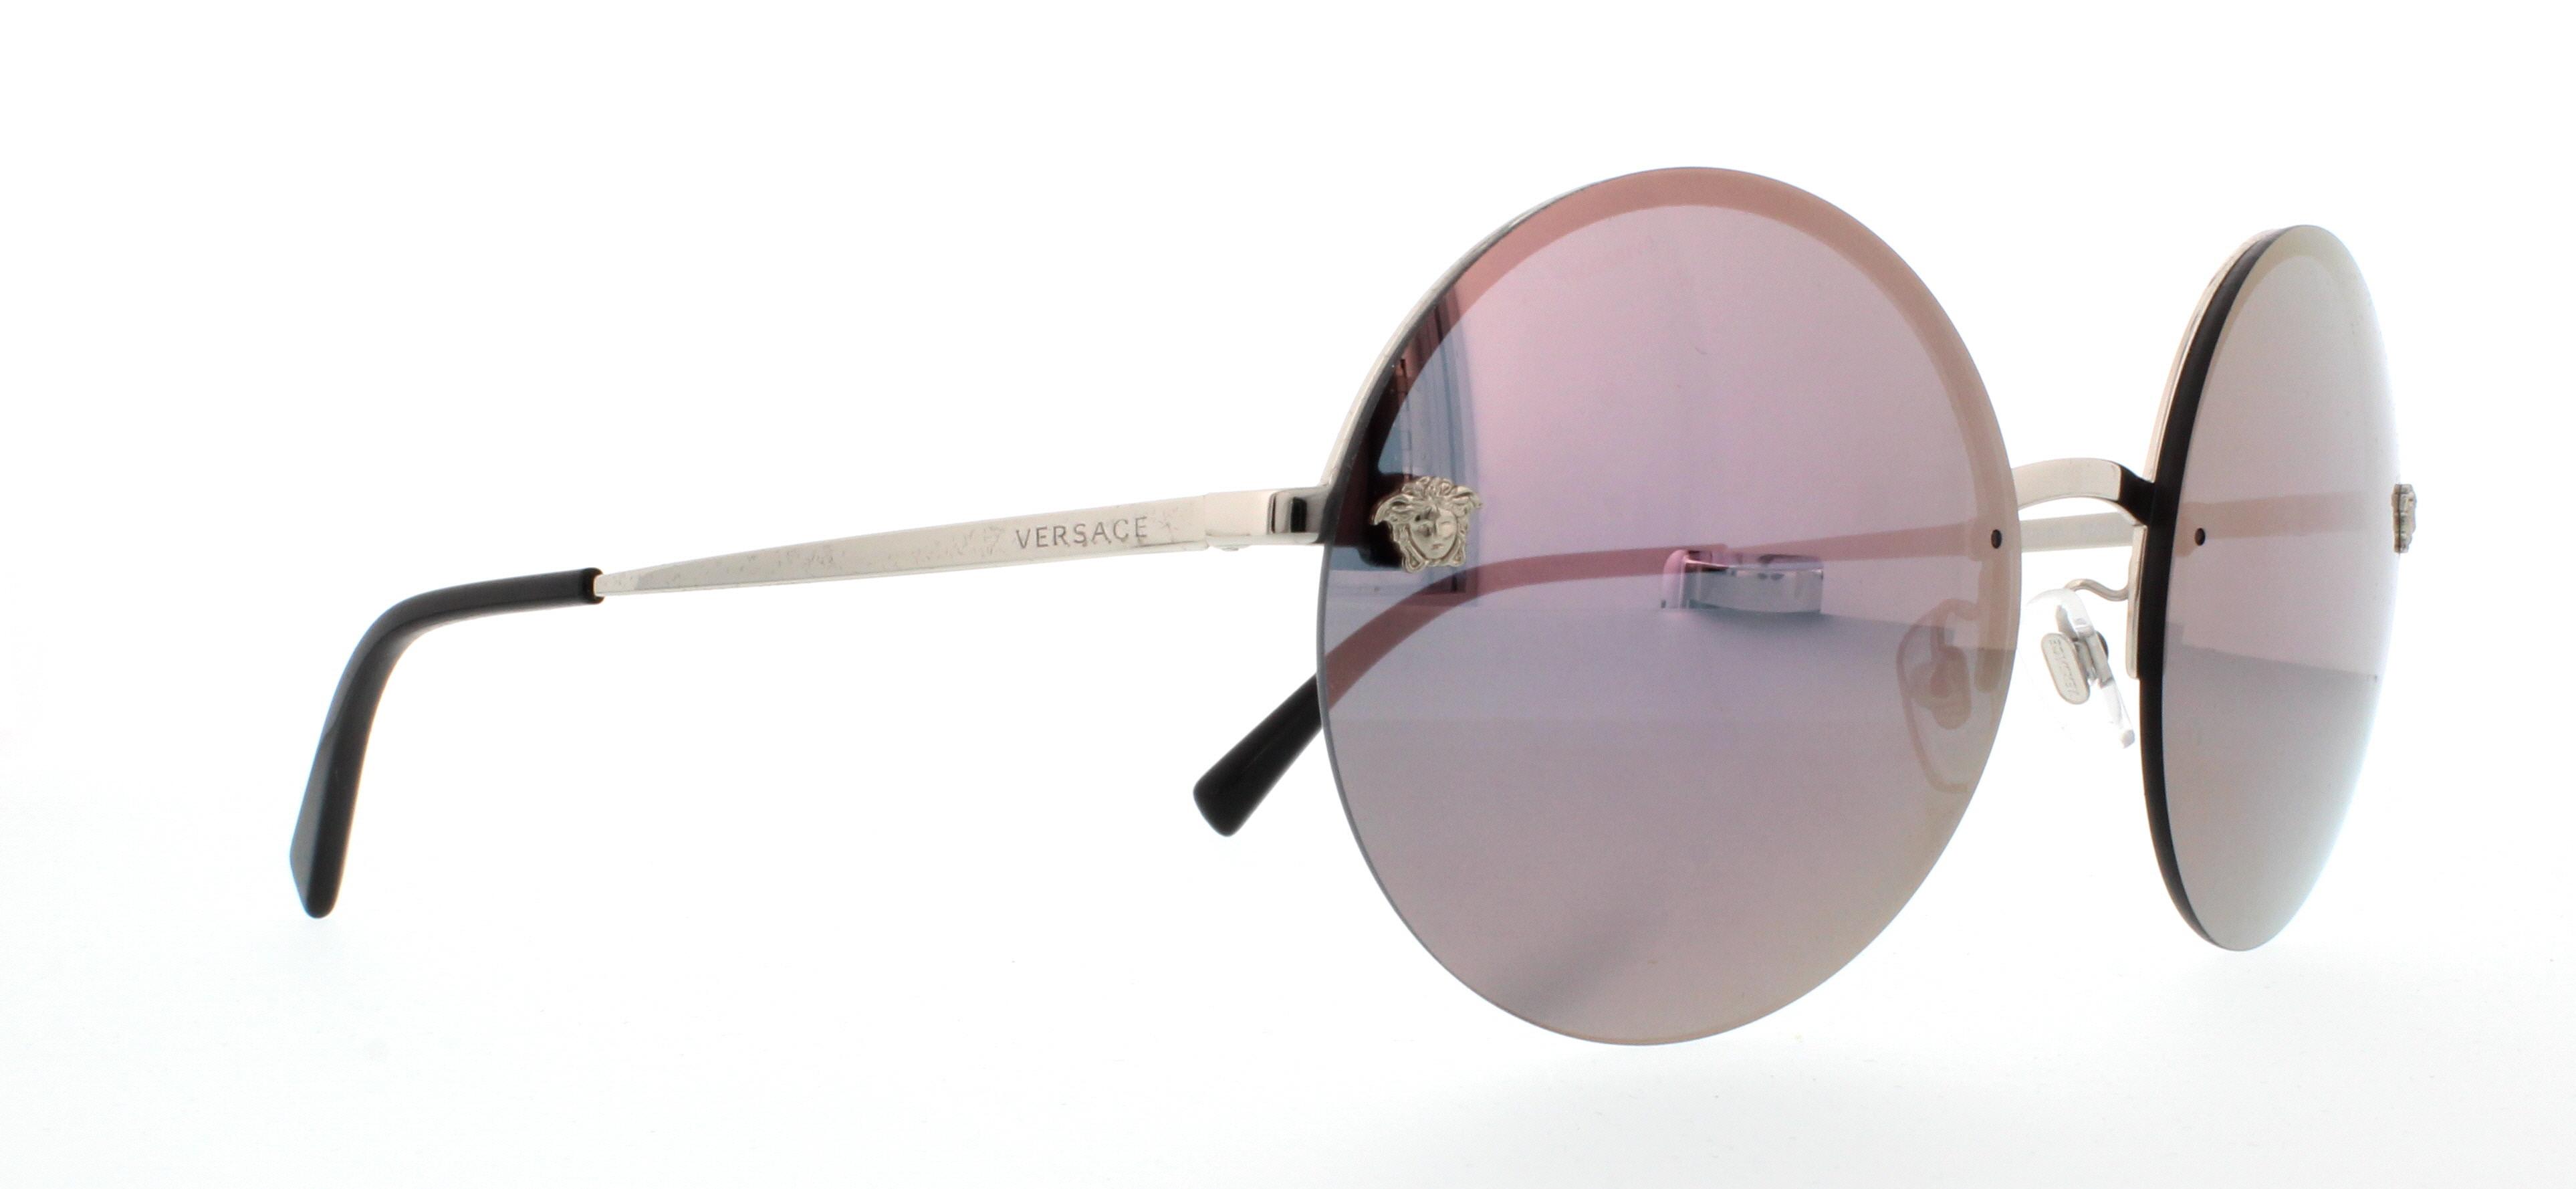 a8e262d0a1 Designer Frames Outlet. Versace VE2176